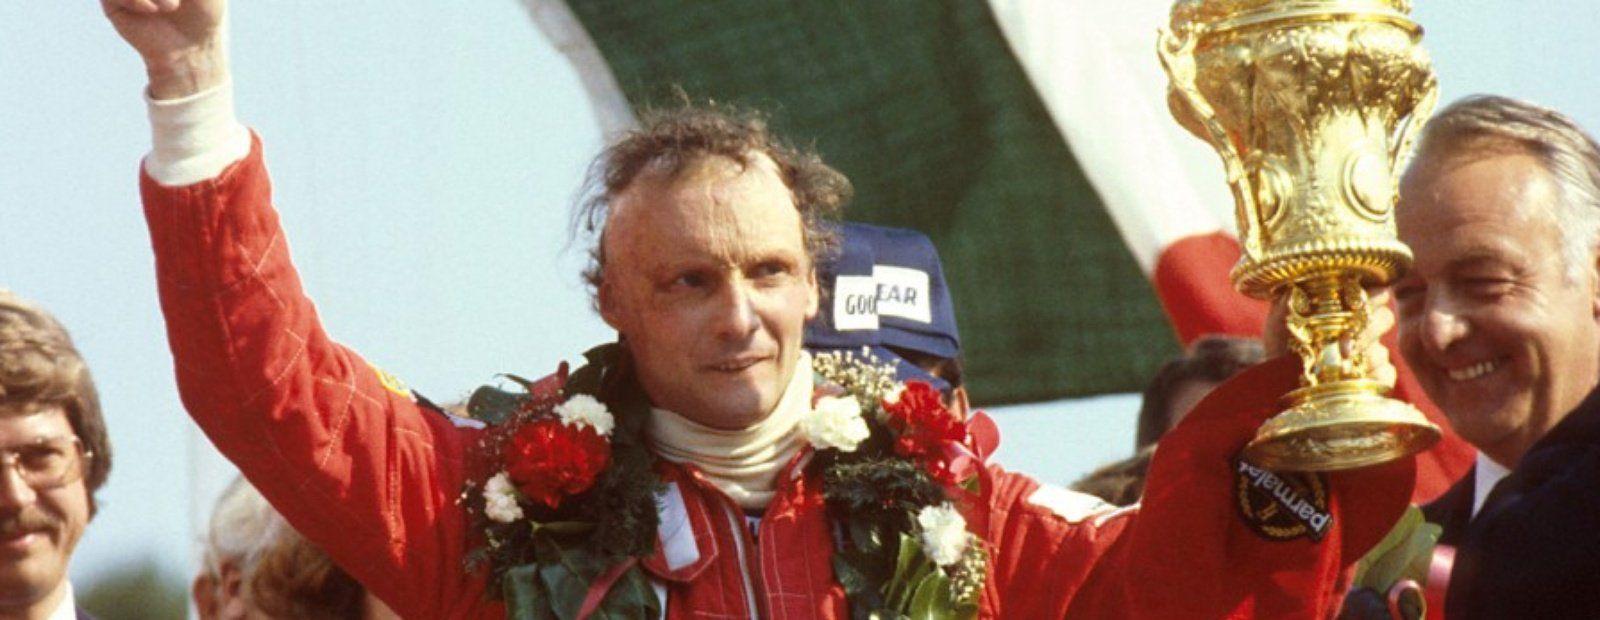 enzo ferrari and niki lauda with Niki Lauda on Flying Ferraris Flugplatz Niki Lauda German Gp 1975 as well 1 as well 350 Ediciones Especiales Ferrari Por Su 70 Cumpleanos 294083 likewise Shadow Dn5 Formula 1 Car as well Gilles Villeneuve.